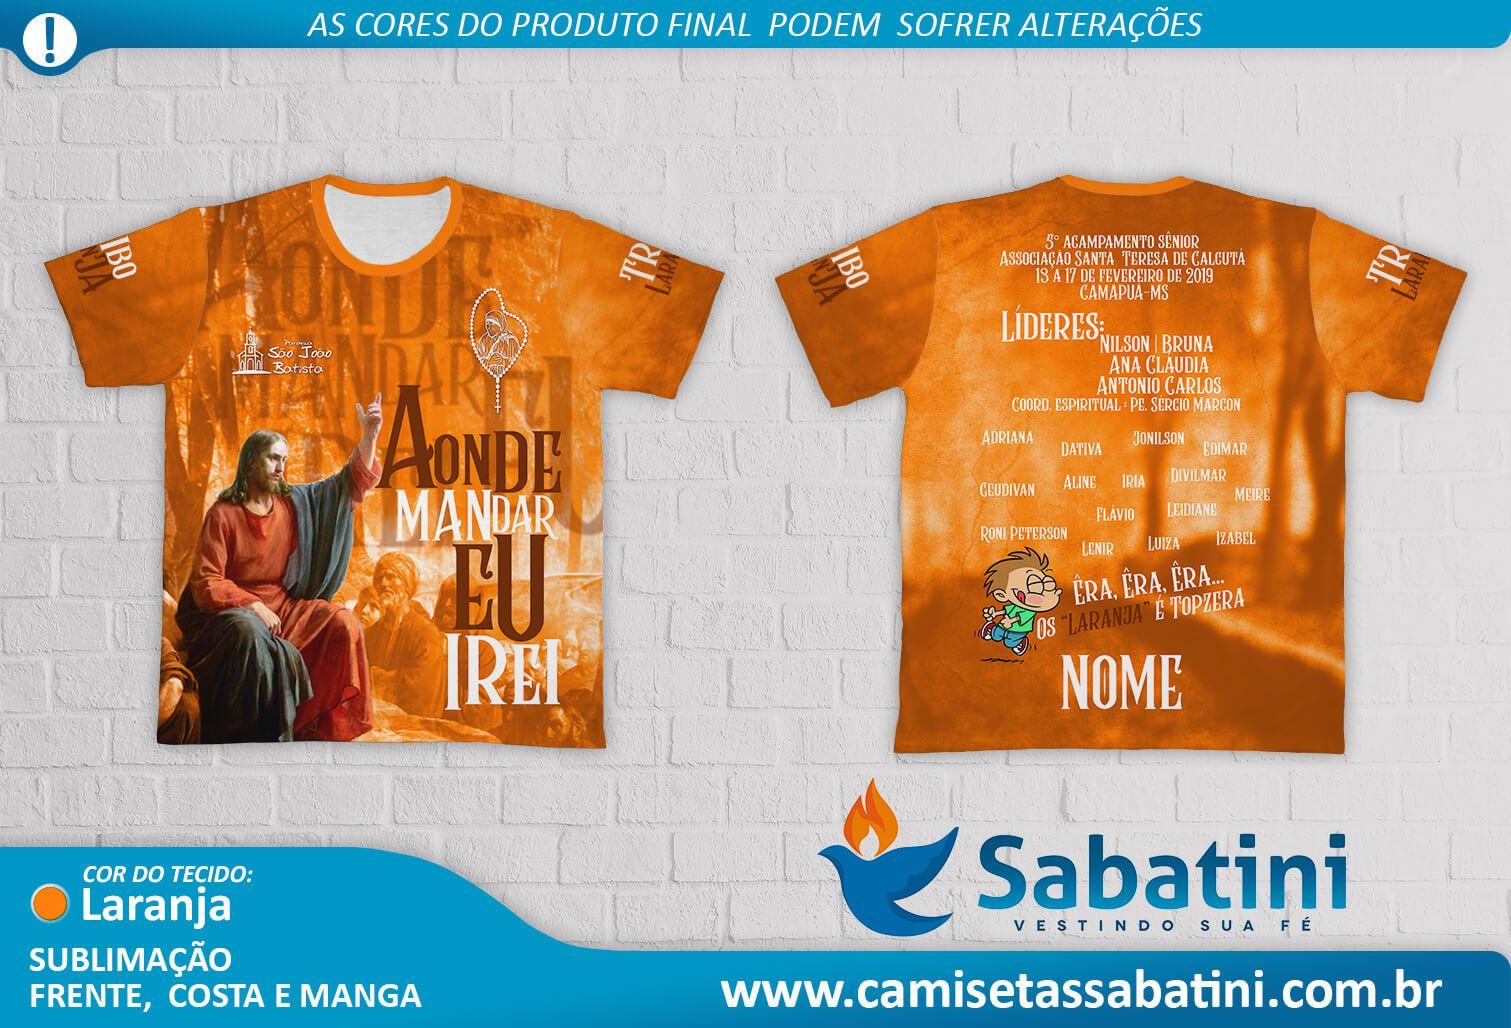 Camiseta Personalizada - Tribo Laranja - Acampamento Aonde Mandar eu Irei - Camapua - MS - ID14674170  - Camisetas Sabatini